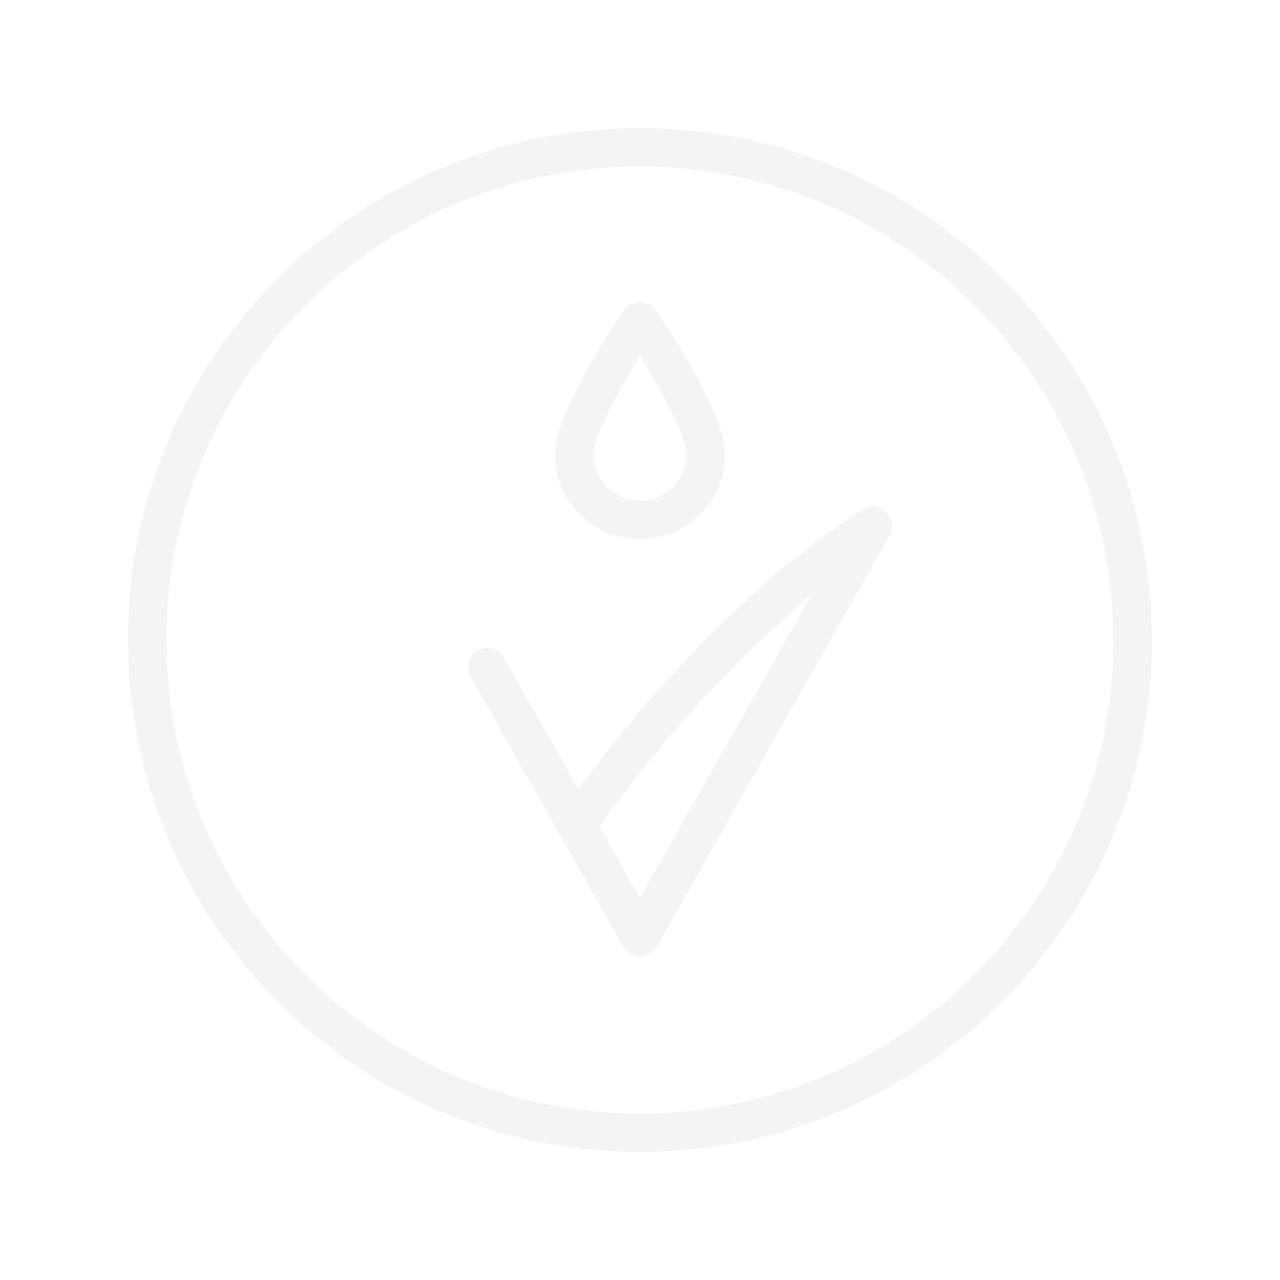 Bourjois LIner Feutre Eyeliner No.11 Noir 0.8ml